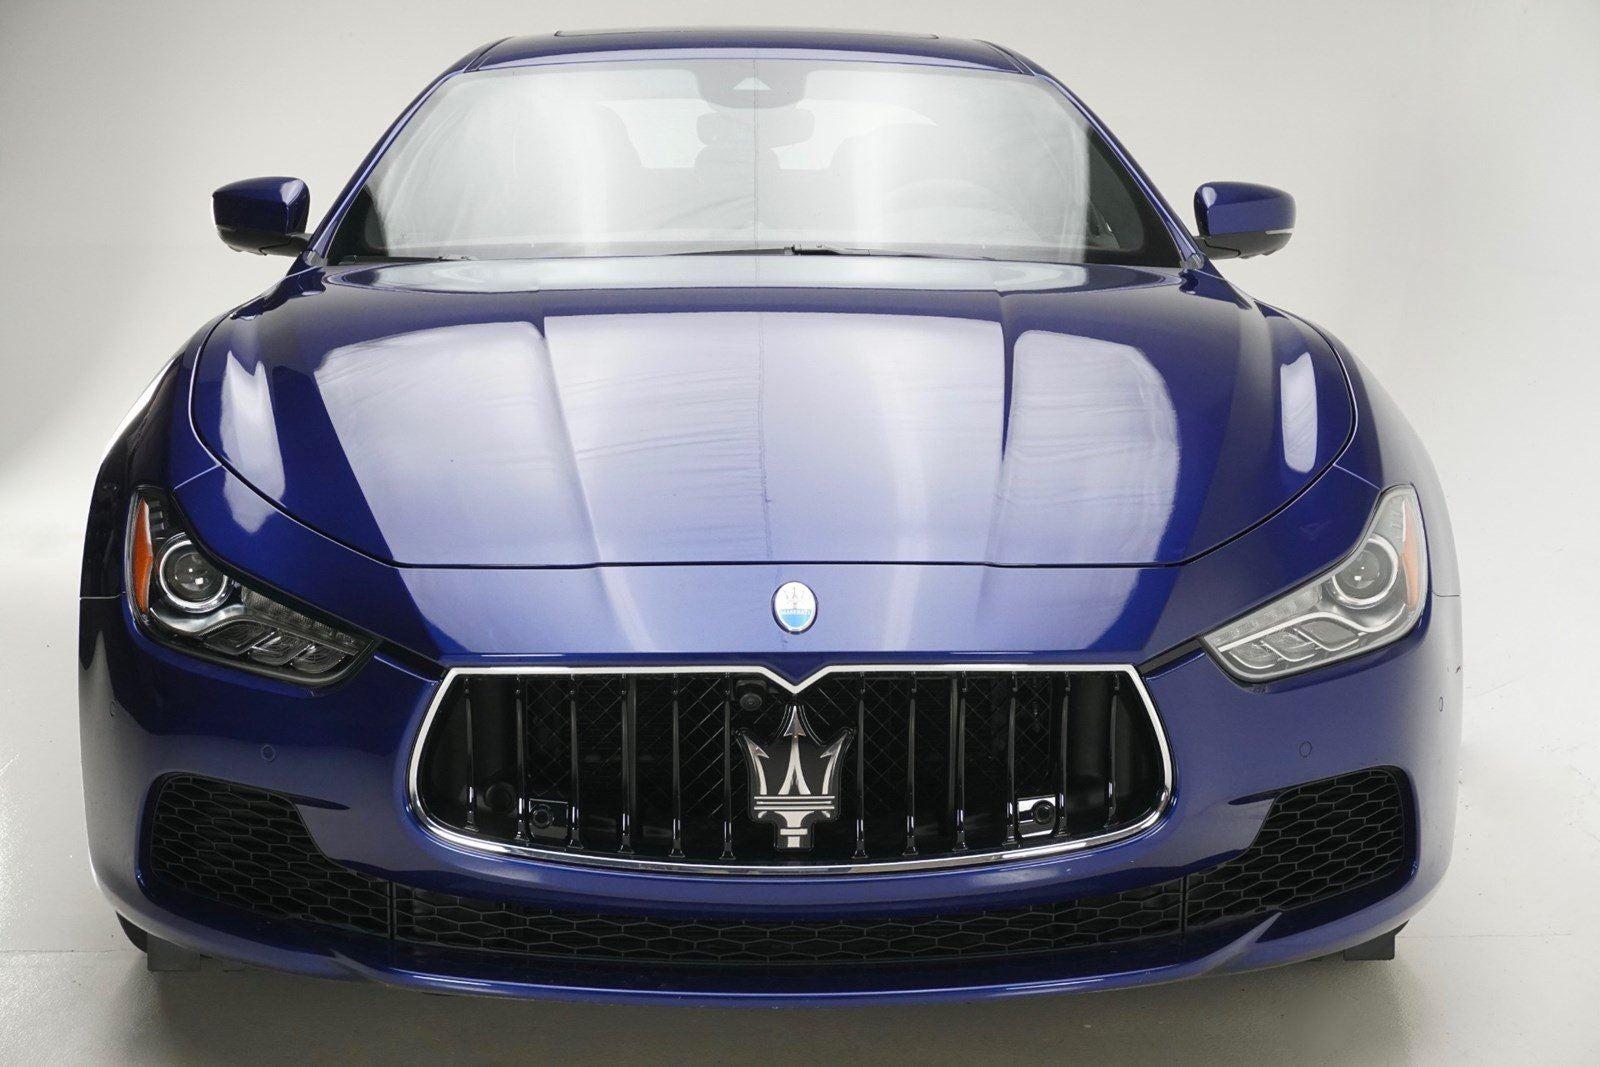 Maserati Ghibli S Charlotte NC Cornelius Davidson - Maserati roadside assistance